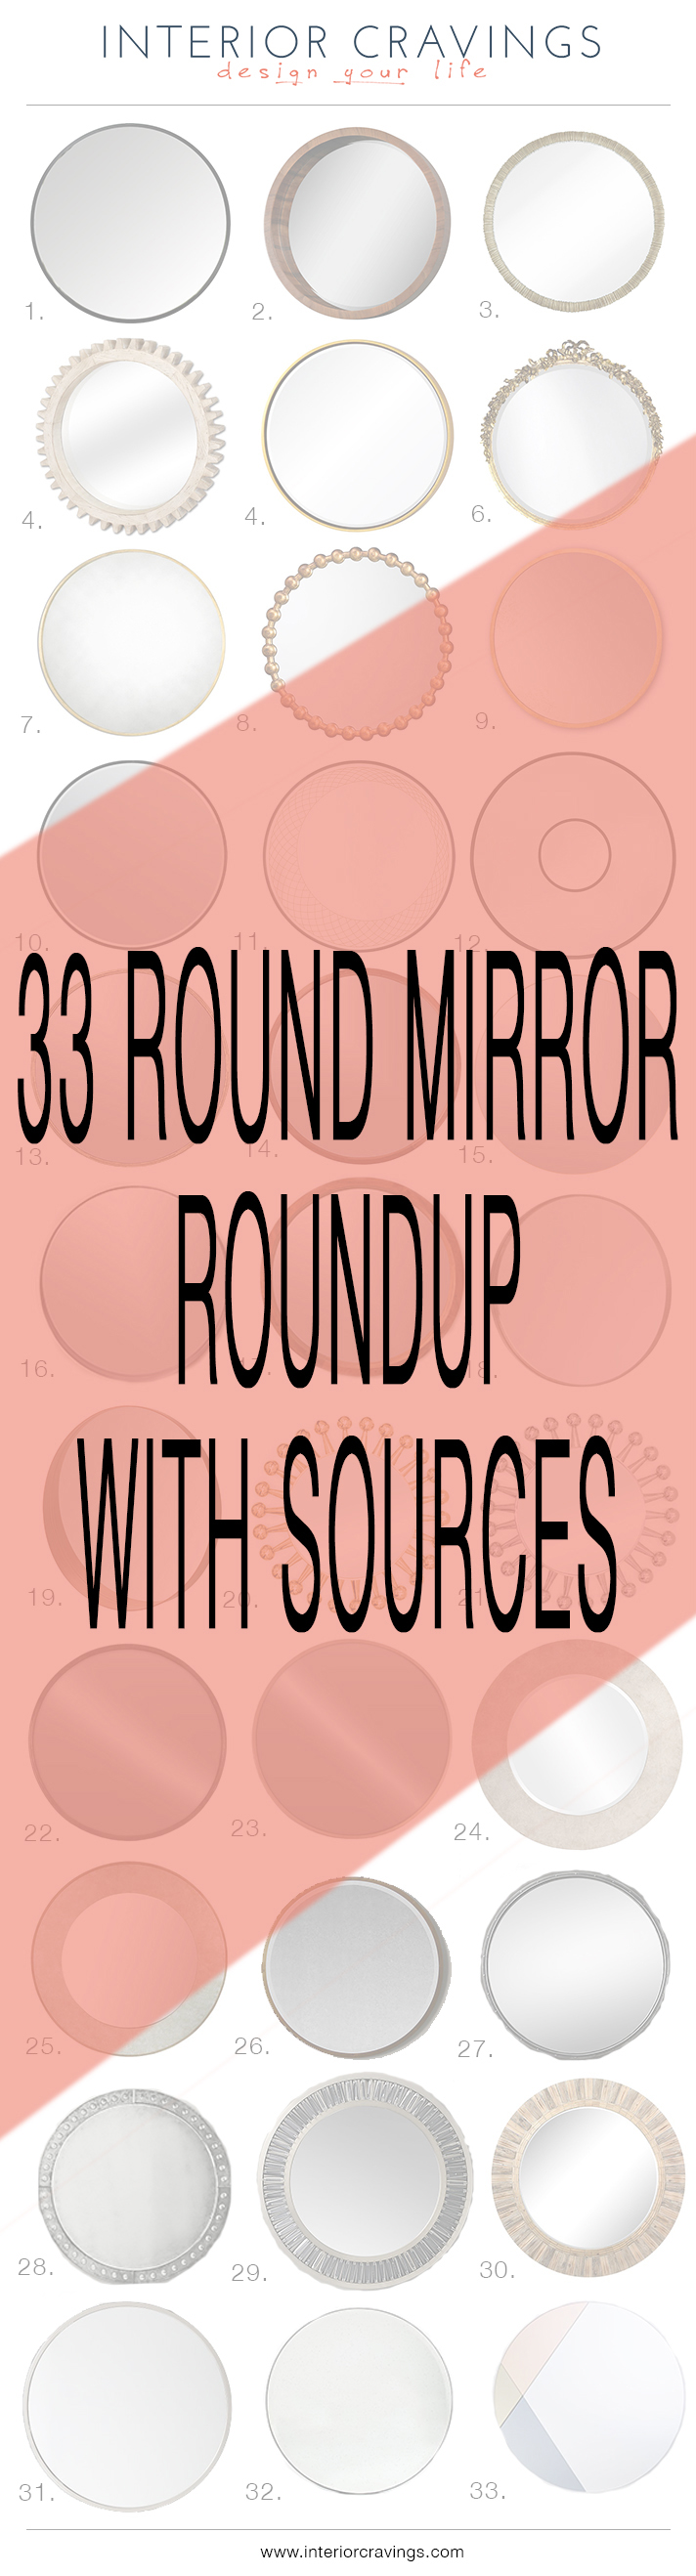 interior-cravings-33-round-mirror-roundup-sith-sources